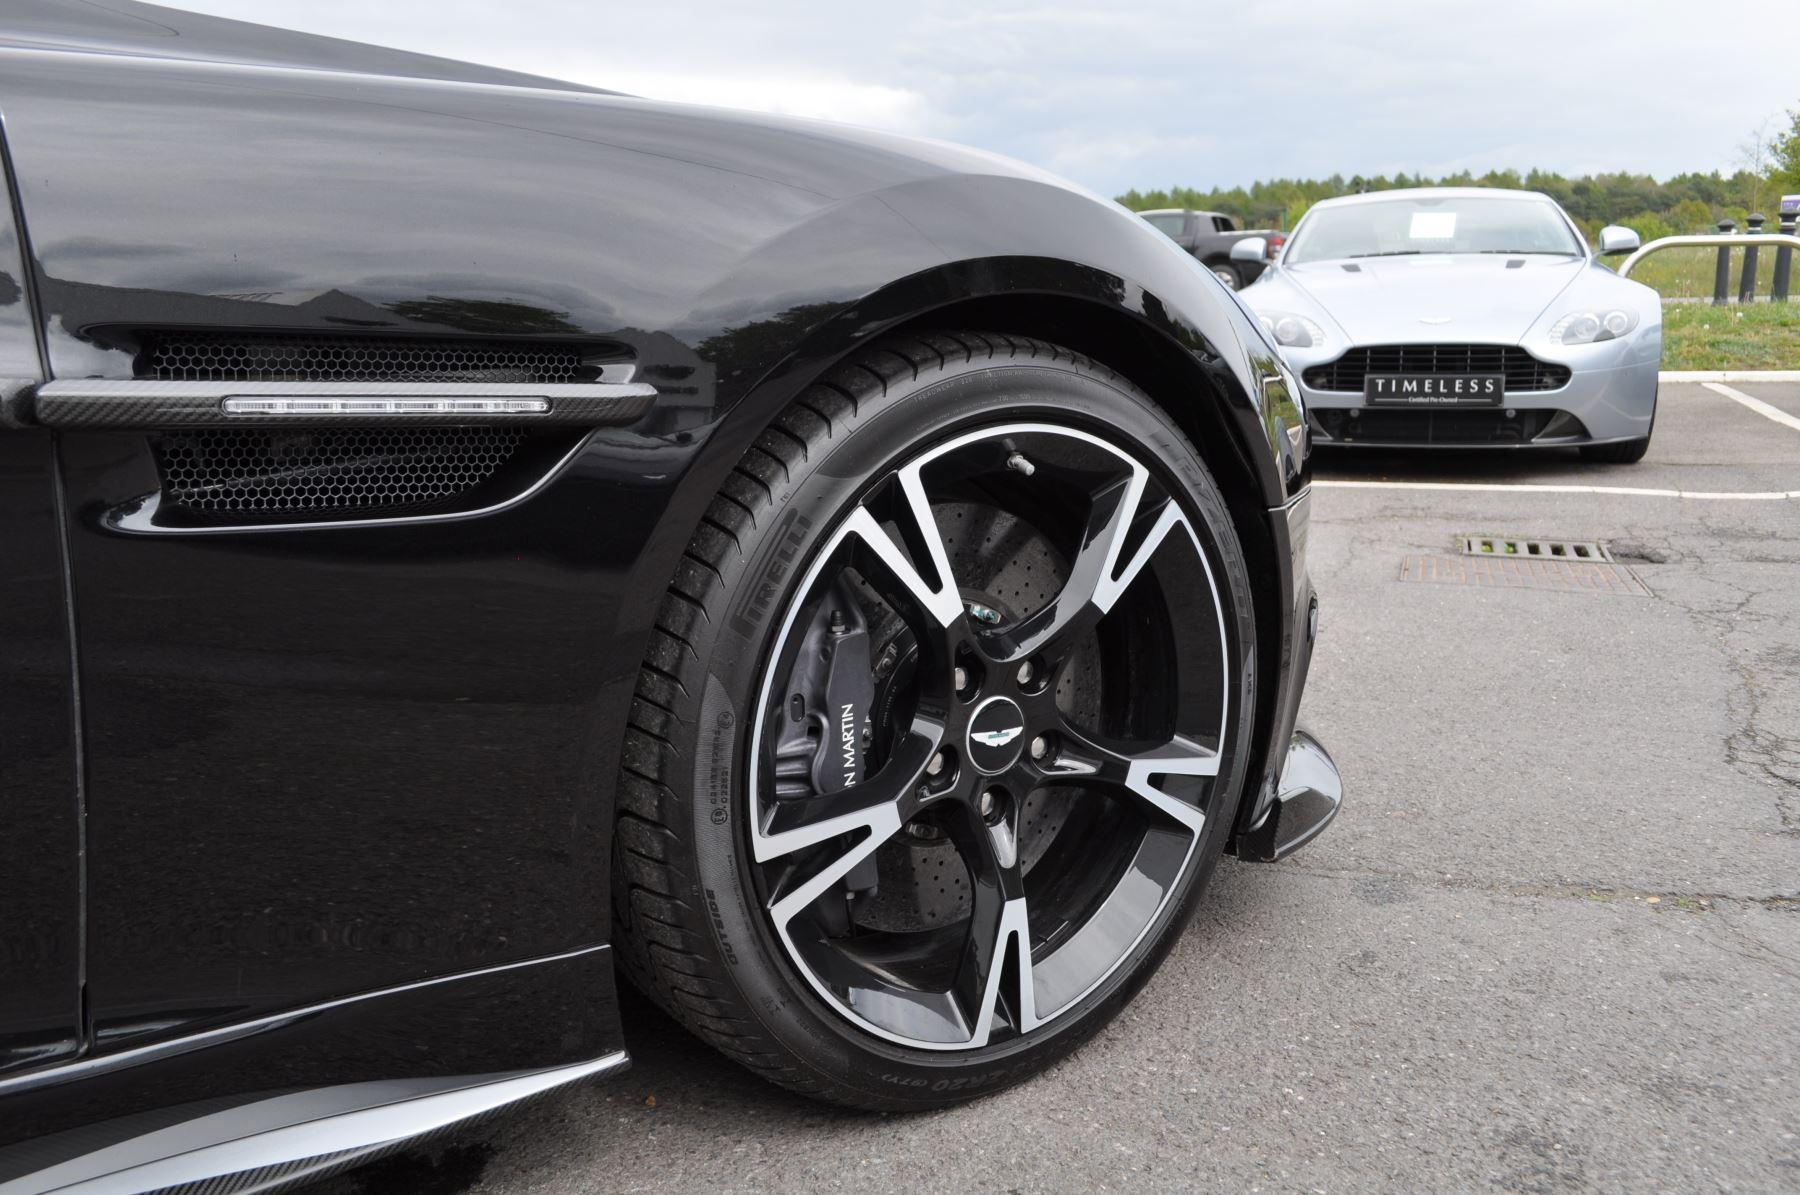 Aston Martin Vanquish S V12 [595] S 2+2 2dr Touchtronic image 46